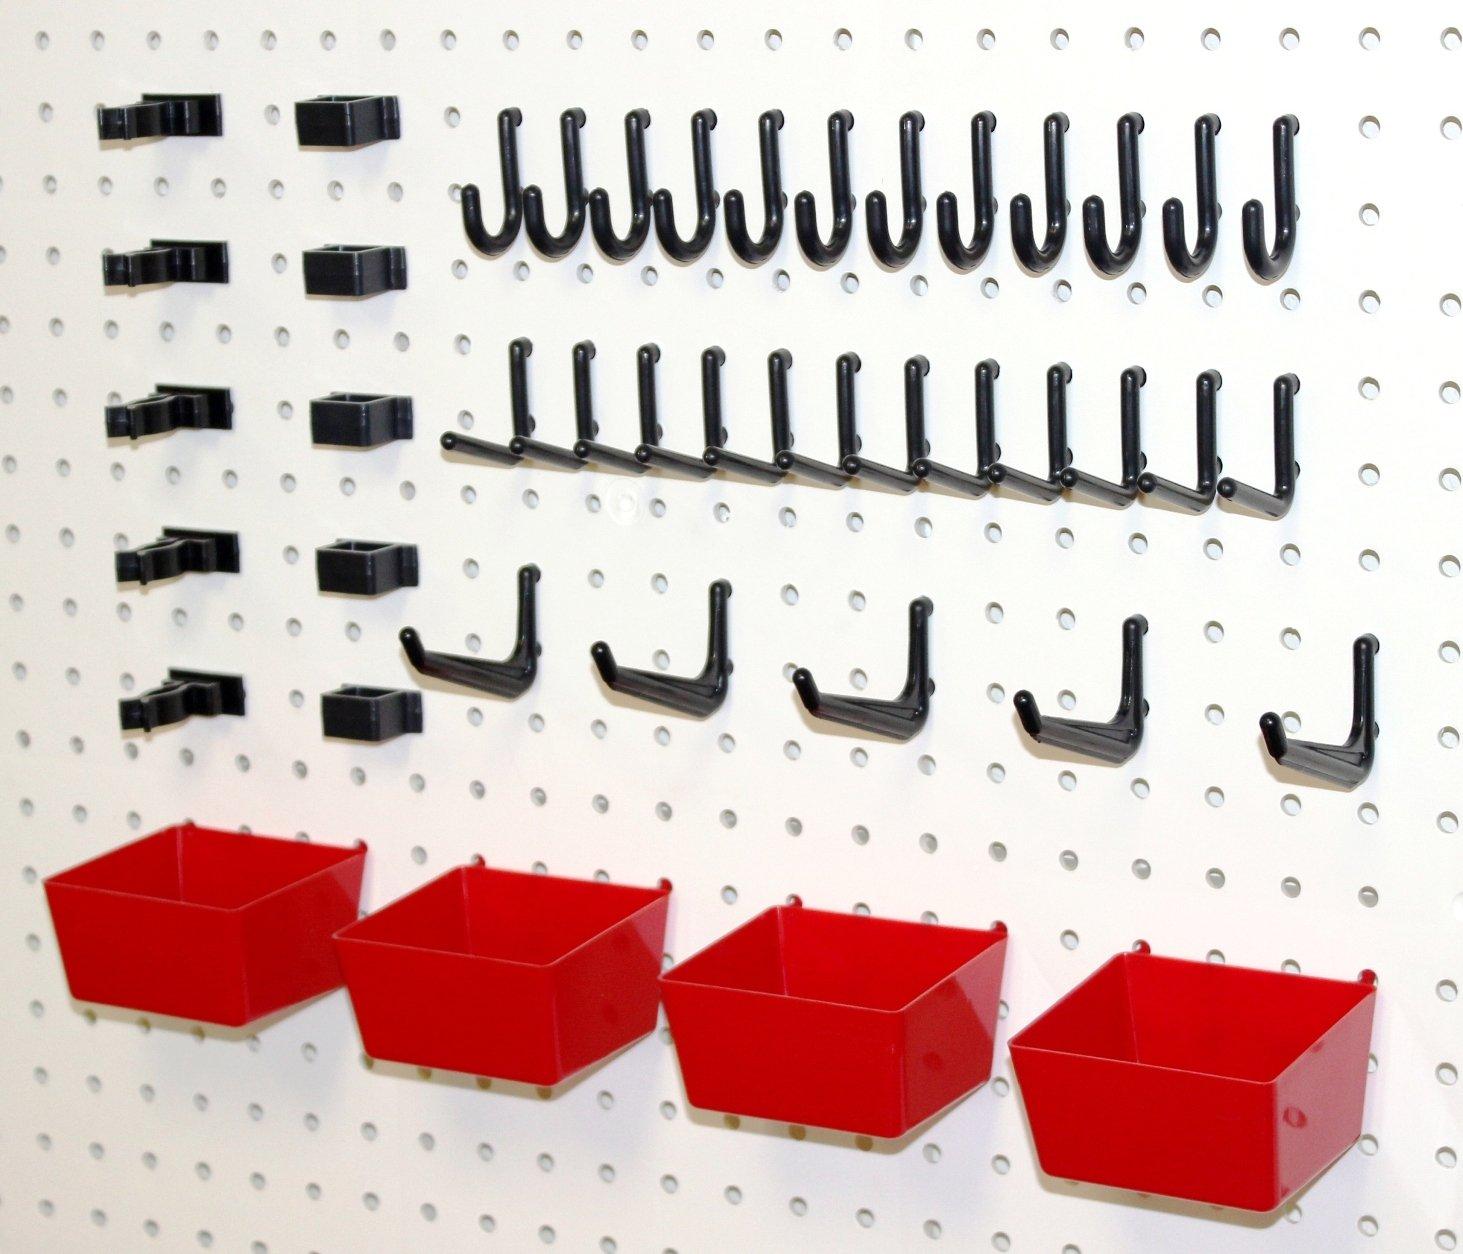 WallPeg Pegboard Hooks Plastic Pegboard Bins 26 Pc. Kit Tool Holders Workbench